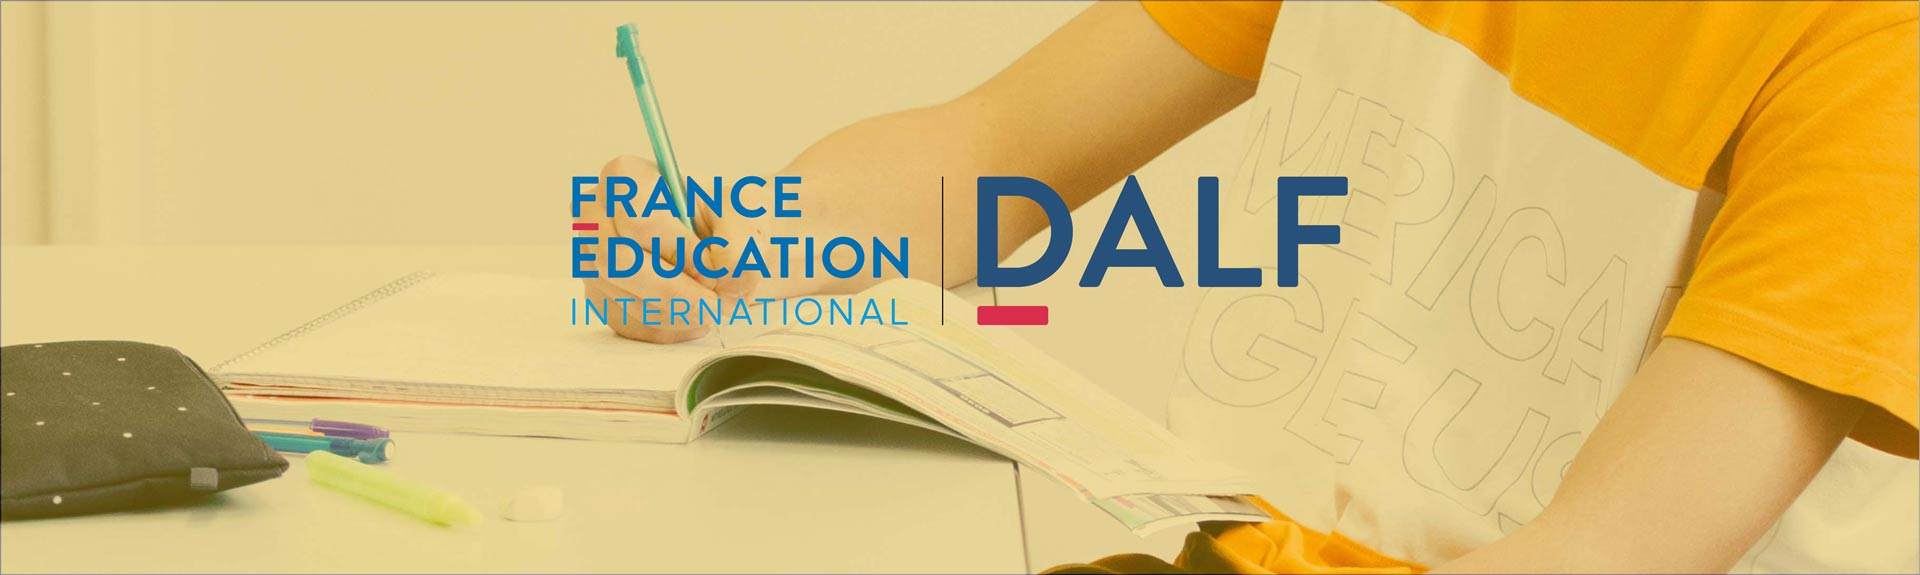 DALF - France Education International